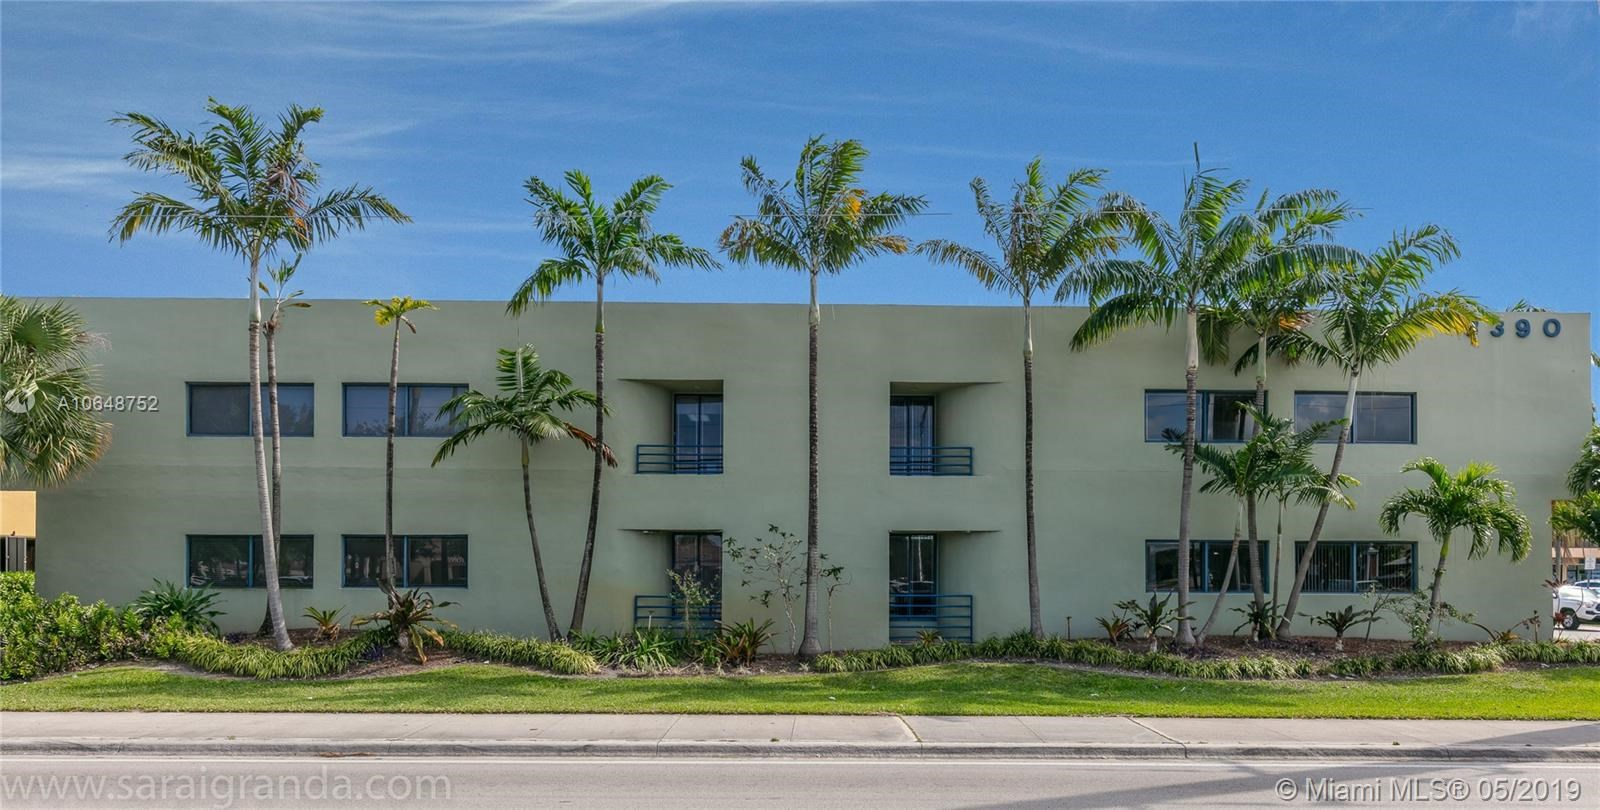 8390 W Flagler St, Miami, FL 33144